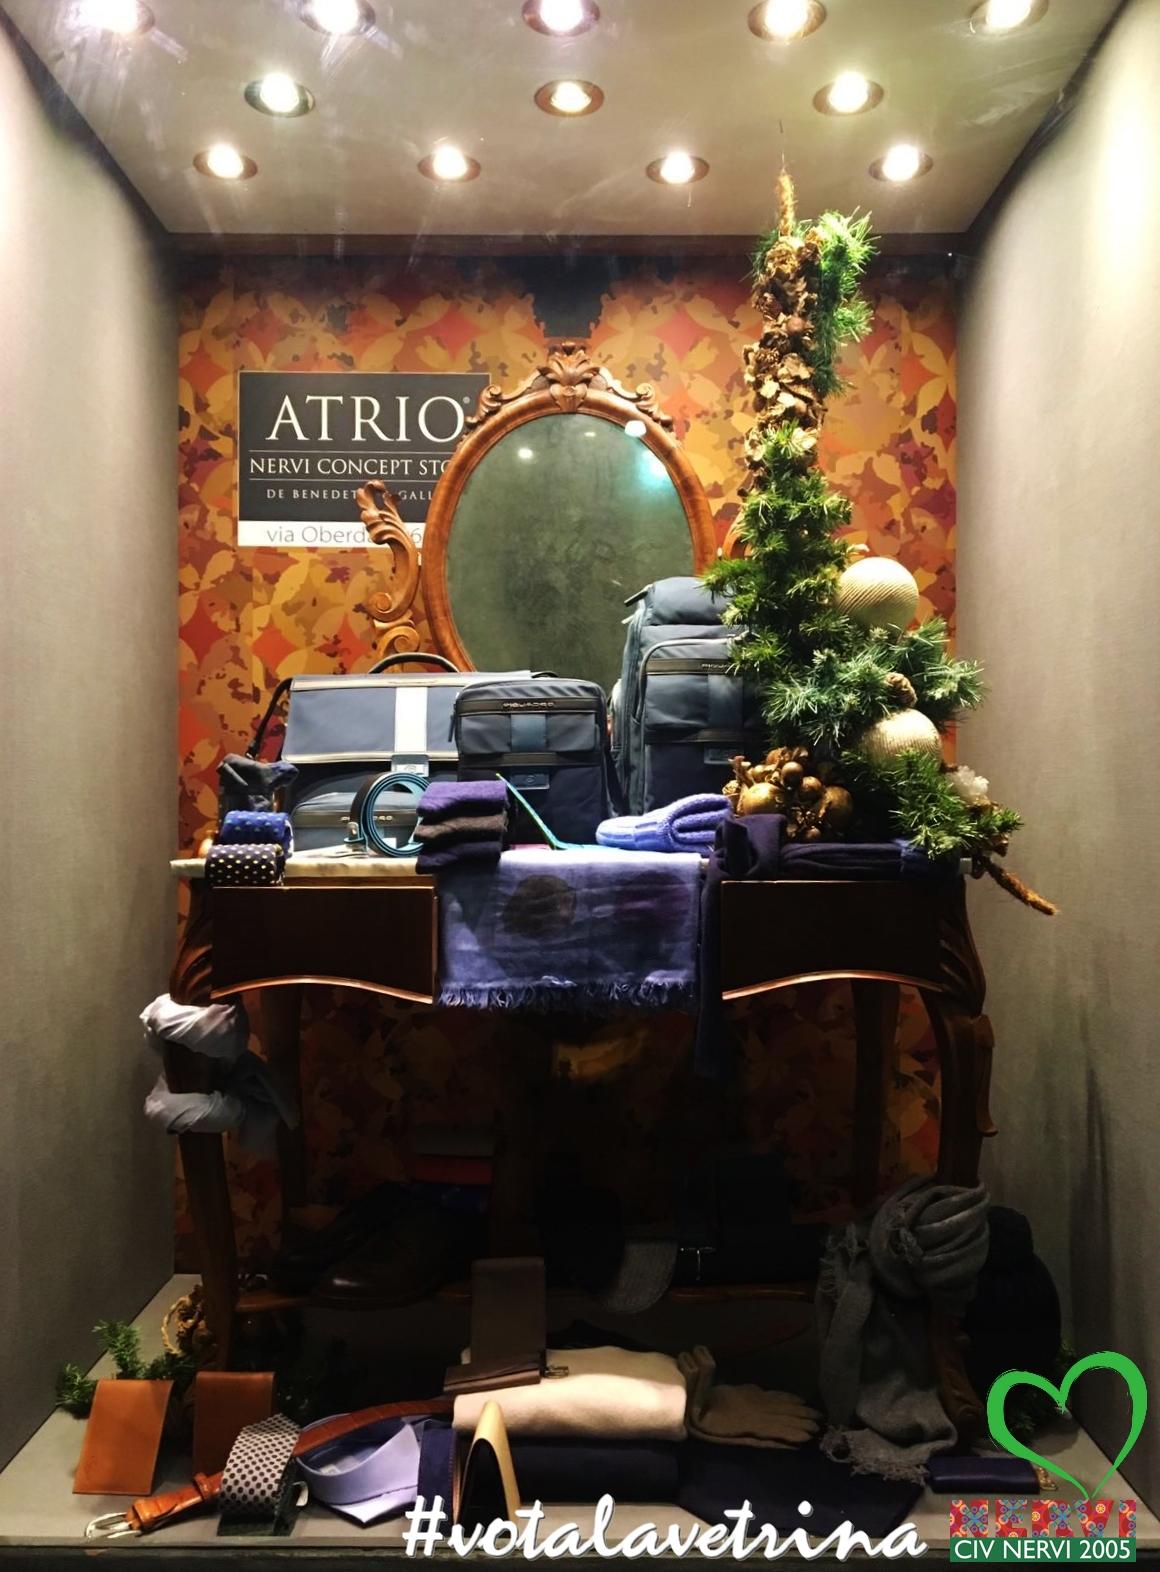 Atrio Concept Store